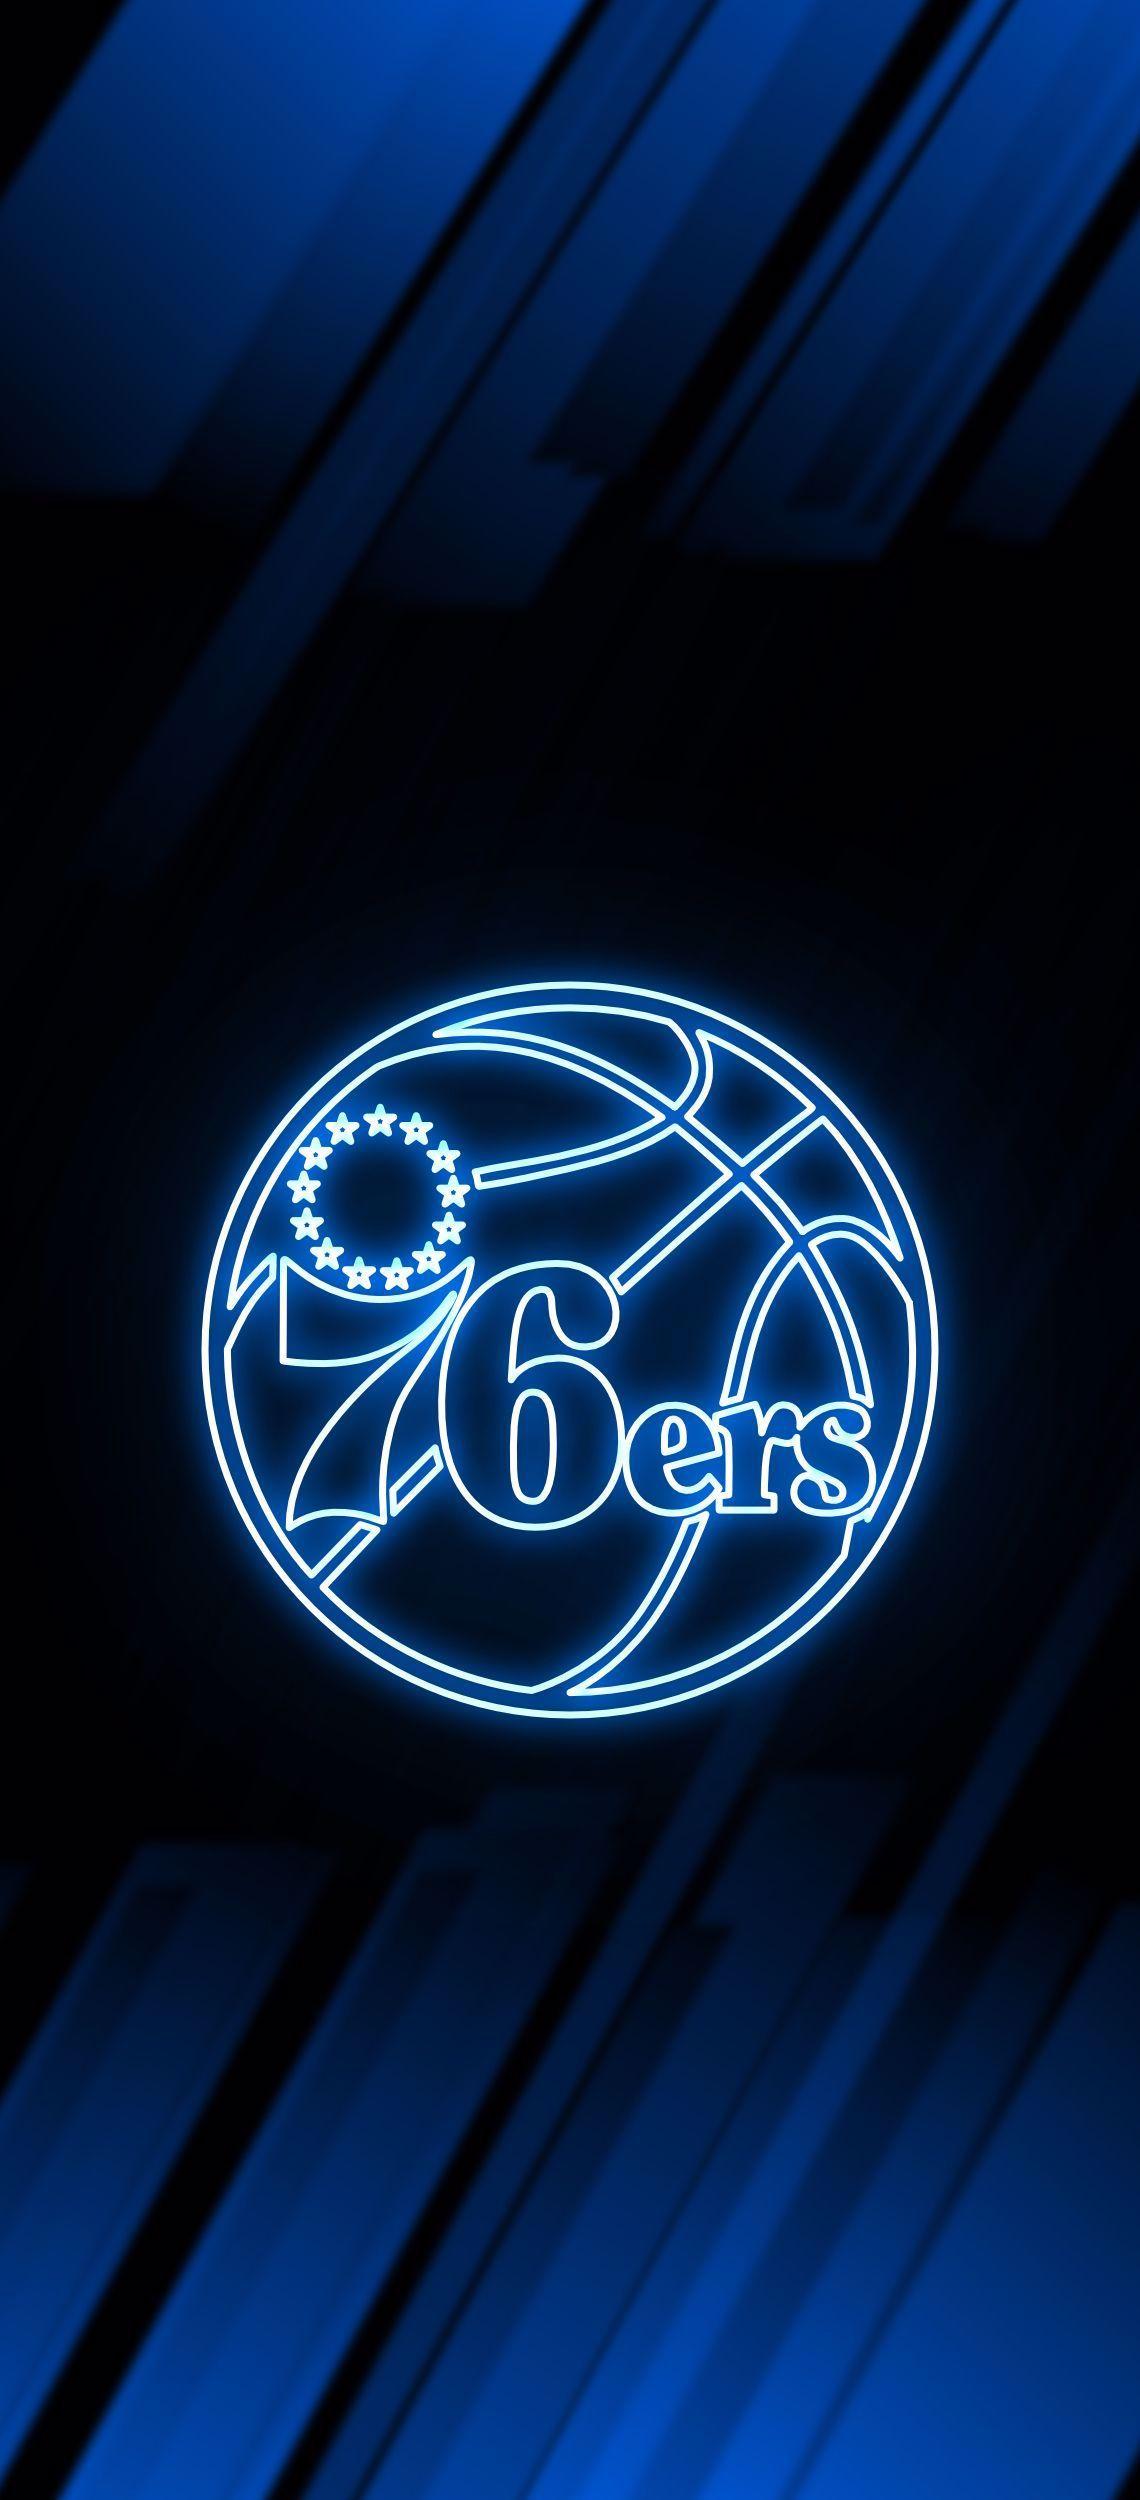 Nba Basketball Team Philadelphia 76ers Phone Wallpaper In 2020 76ers Nba Basketball Teams Philadelphia 76ers